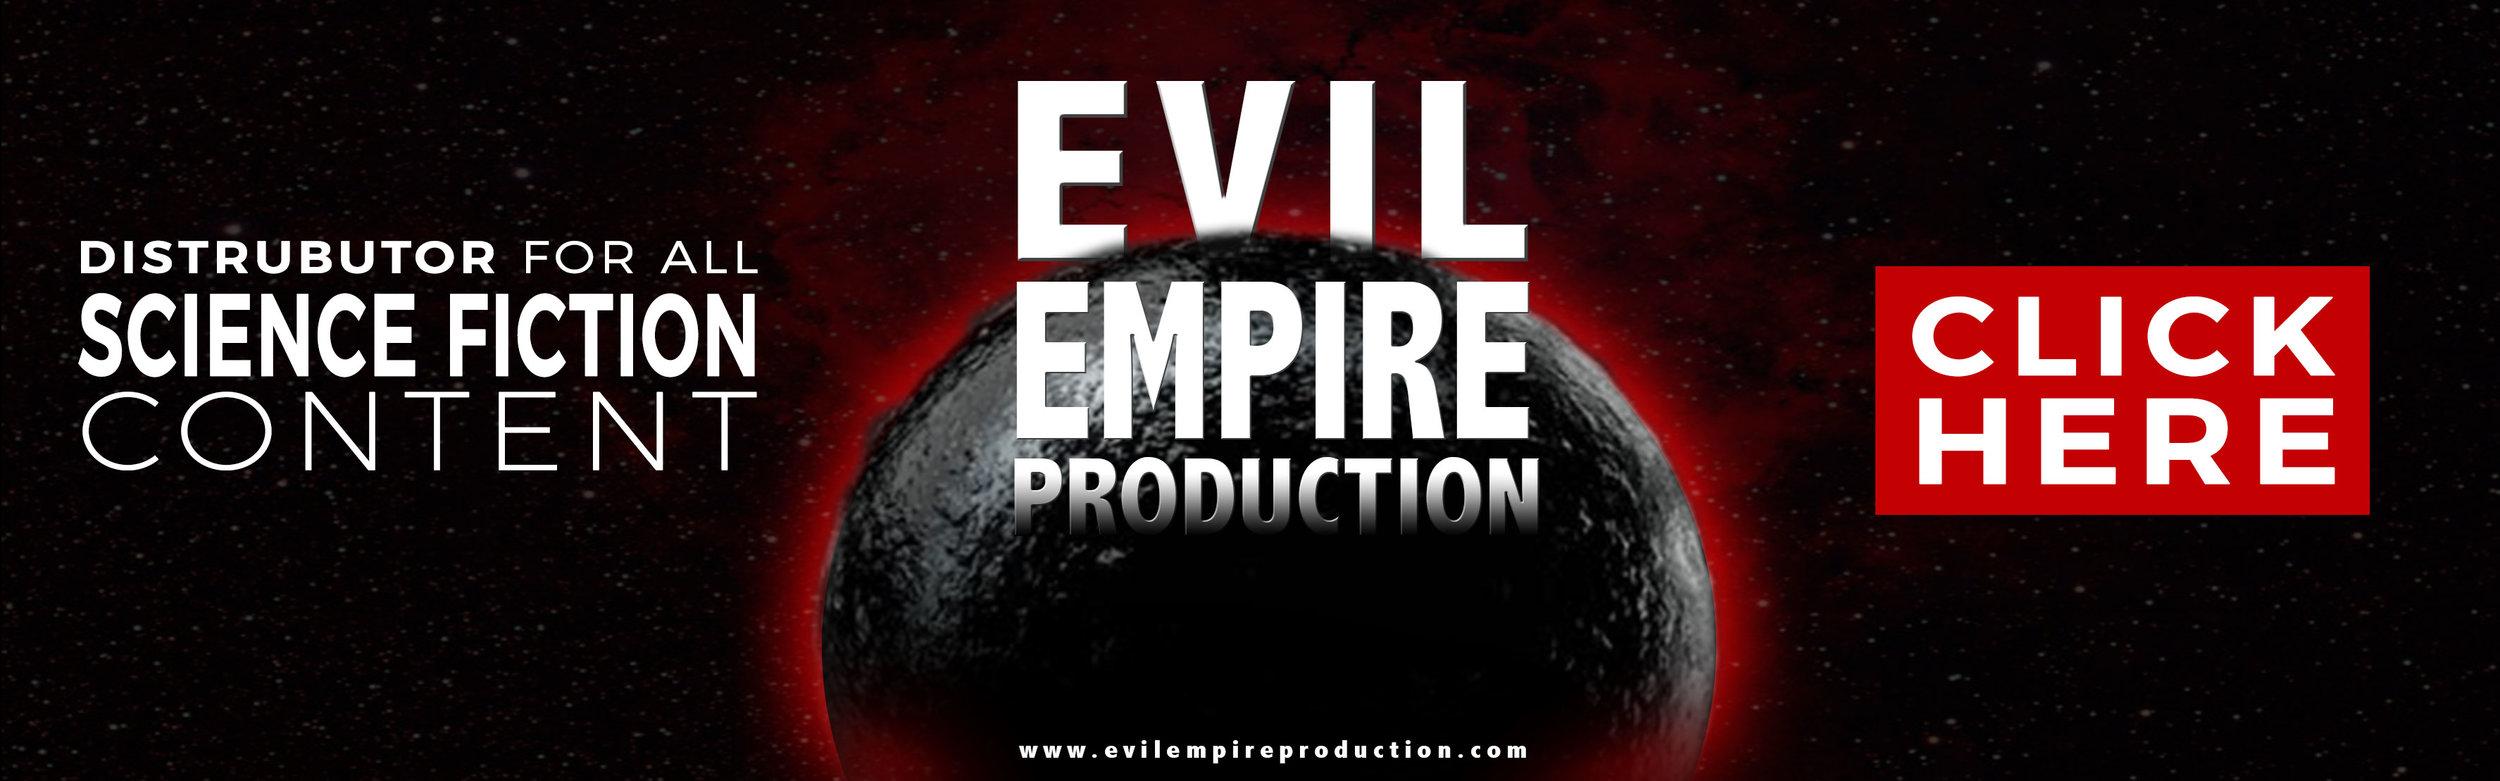 EEP-AD-scifi-wide-banner.jpg